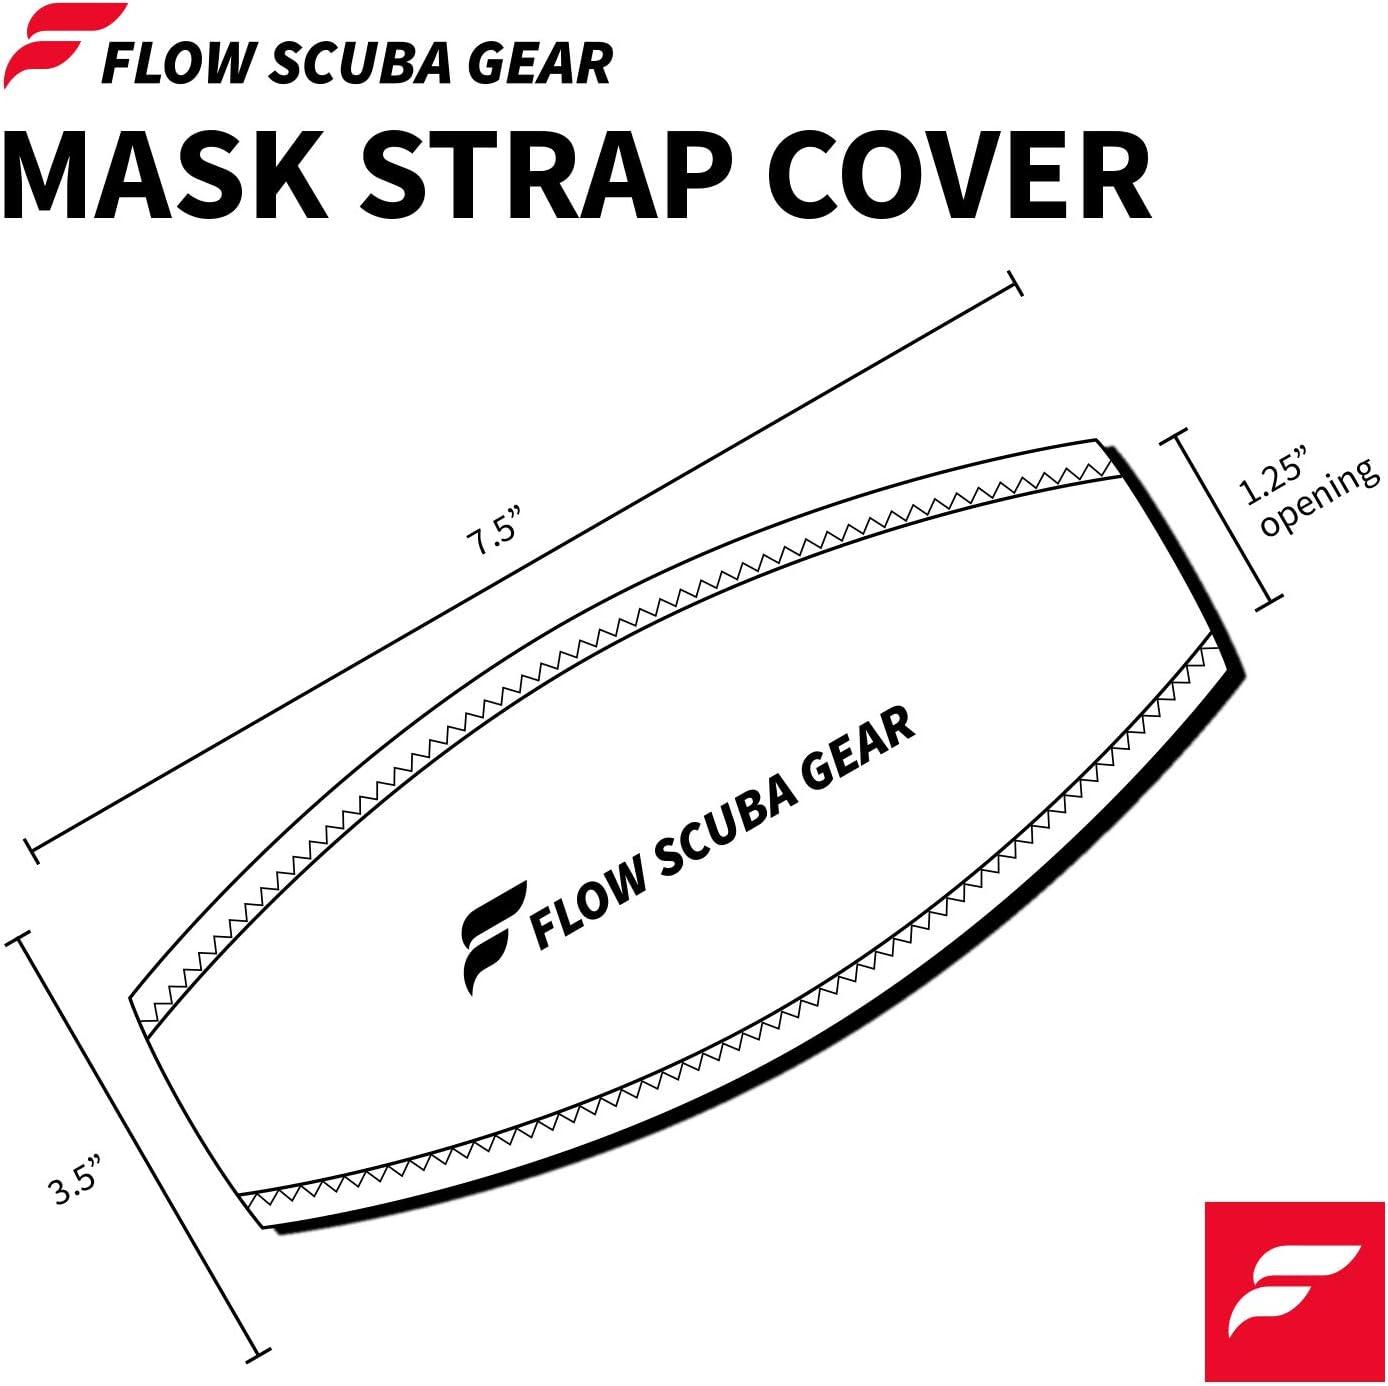 Flow Scuba Gear Diving Mask Slap Straps Neoprene Cover for Dive and Snorkel Masks